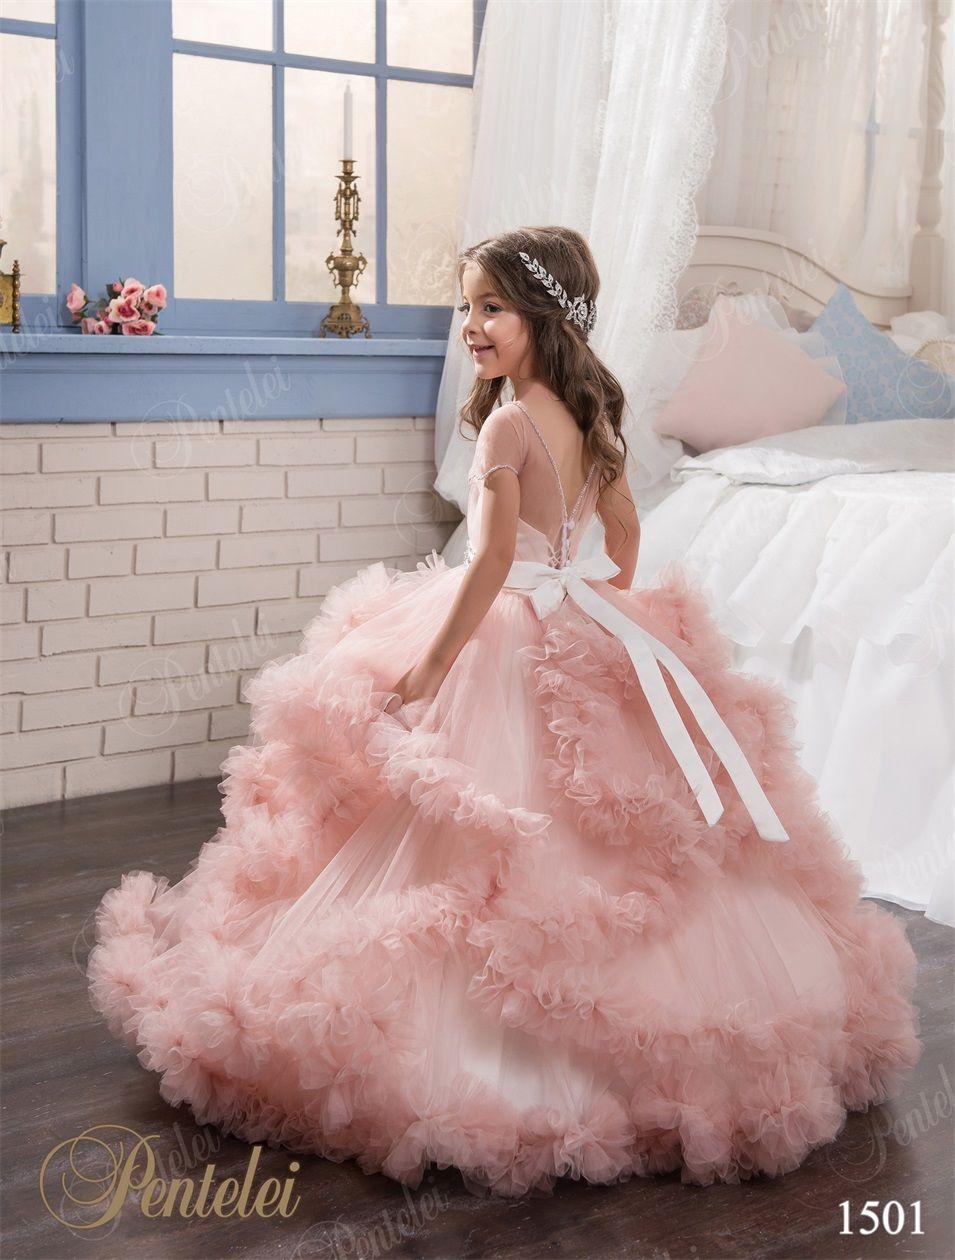 Flying-cloud Flower Girls Dresses 2016 Pentelei Princess Tiered Blush Pink Tulle Tutu Girls Pageant Gowns Floor Length Custom Made